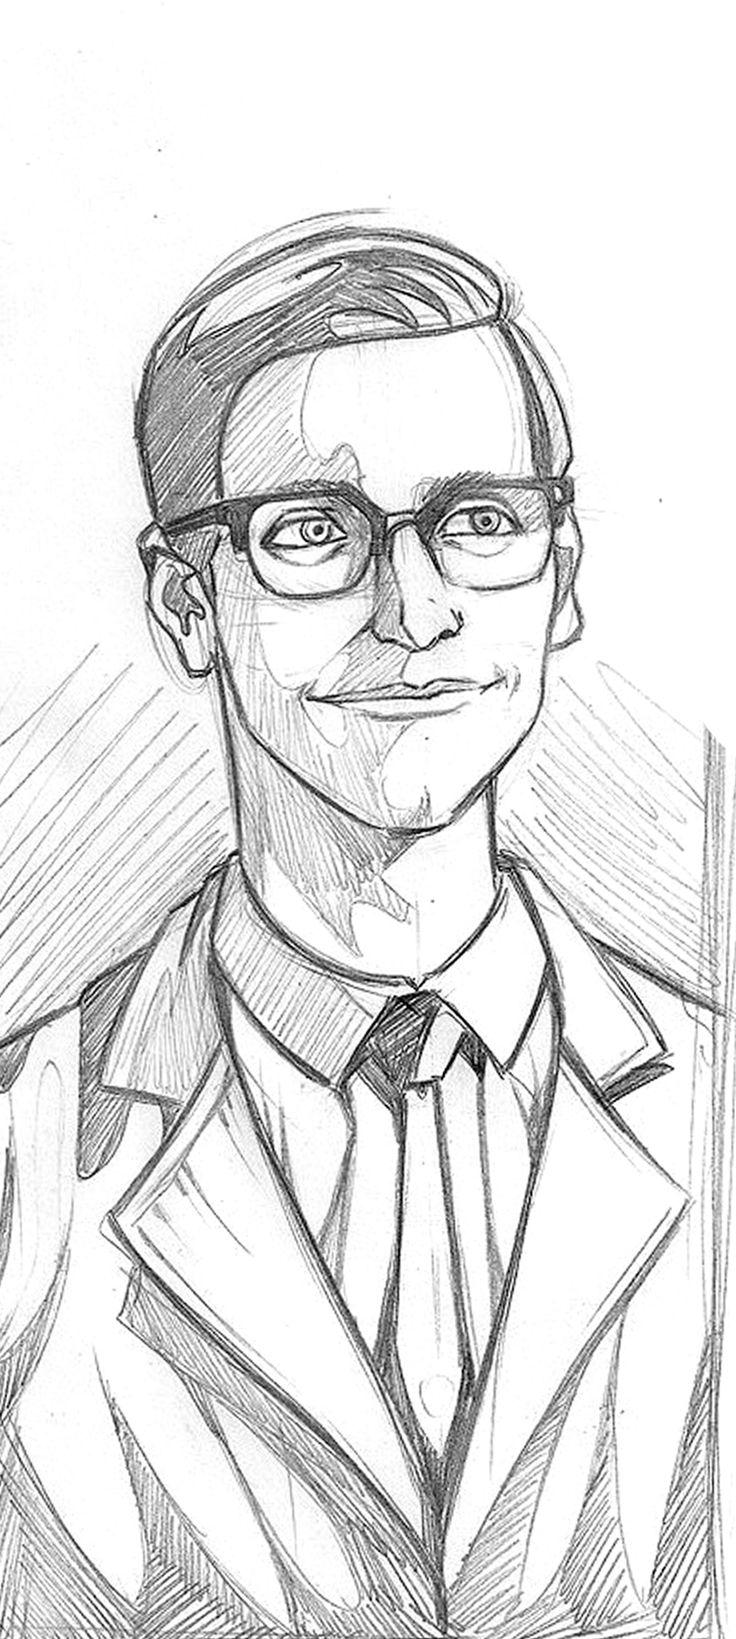 Nigma #Gotham  #Sketch #Sketchbook #Bookart #book #Character #CharacterDesign #Comic #Comicart #Comicartist #Artwork